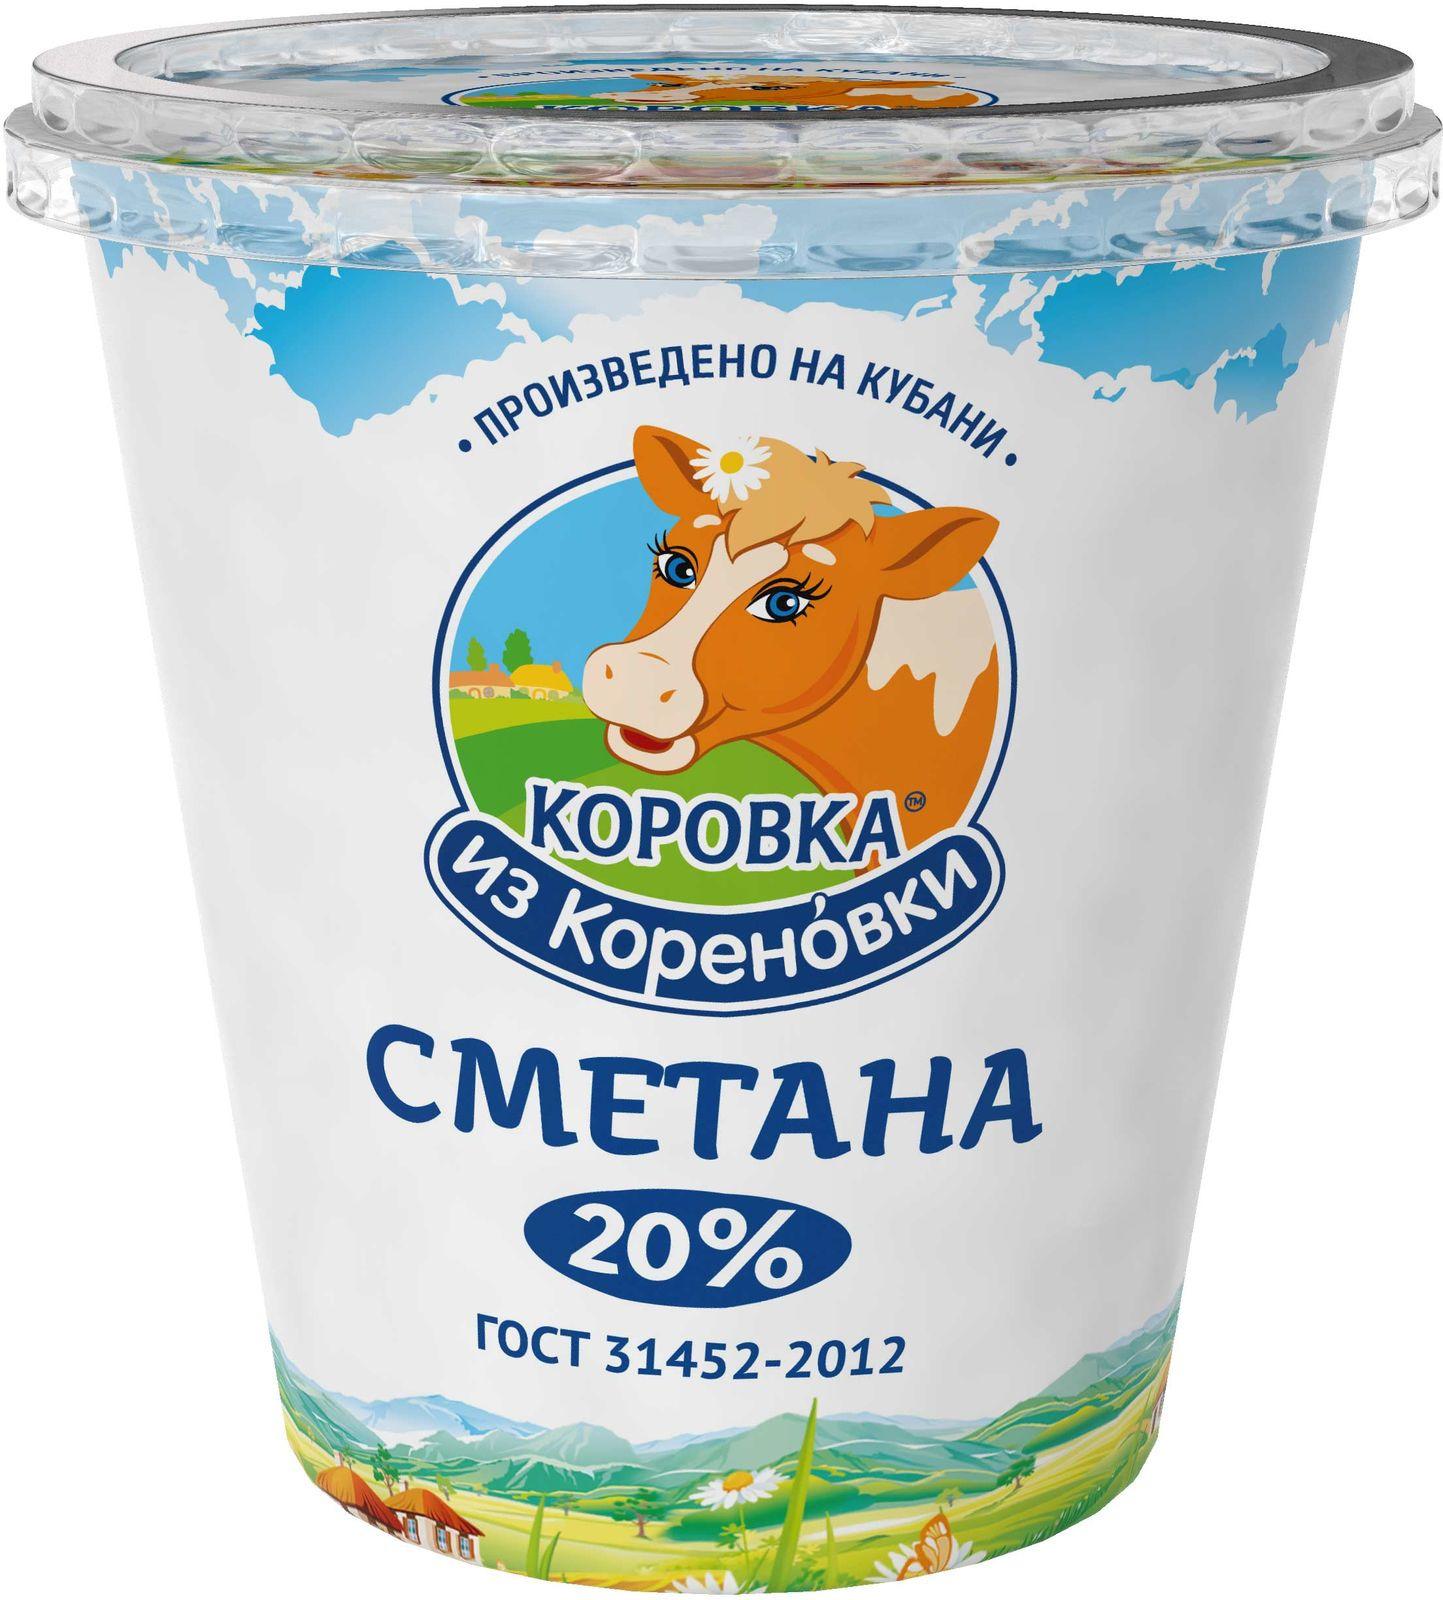 Сметана Коровка из Кореновки, 20%, 330 г простоквашино сметана 20% 315 г